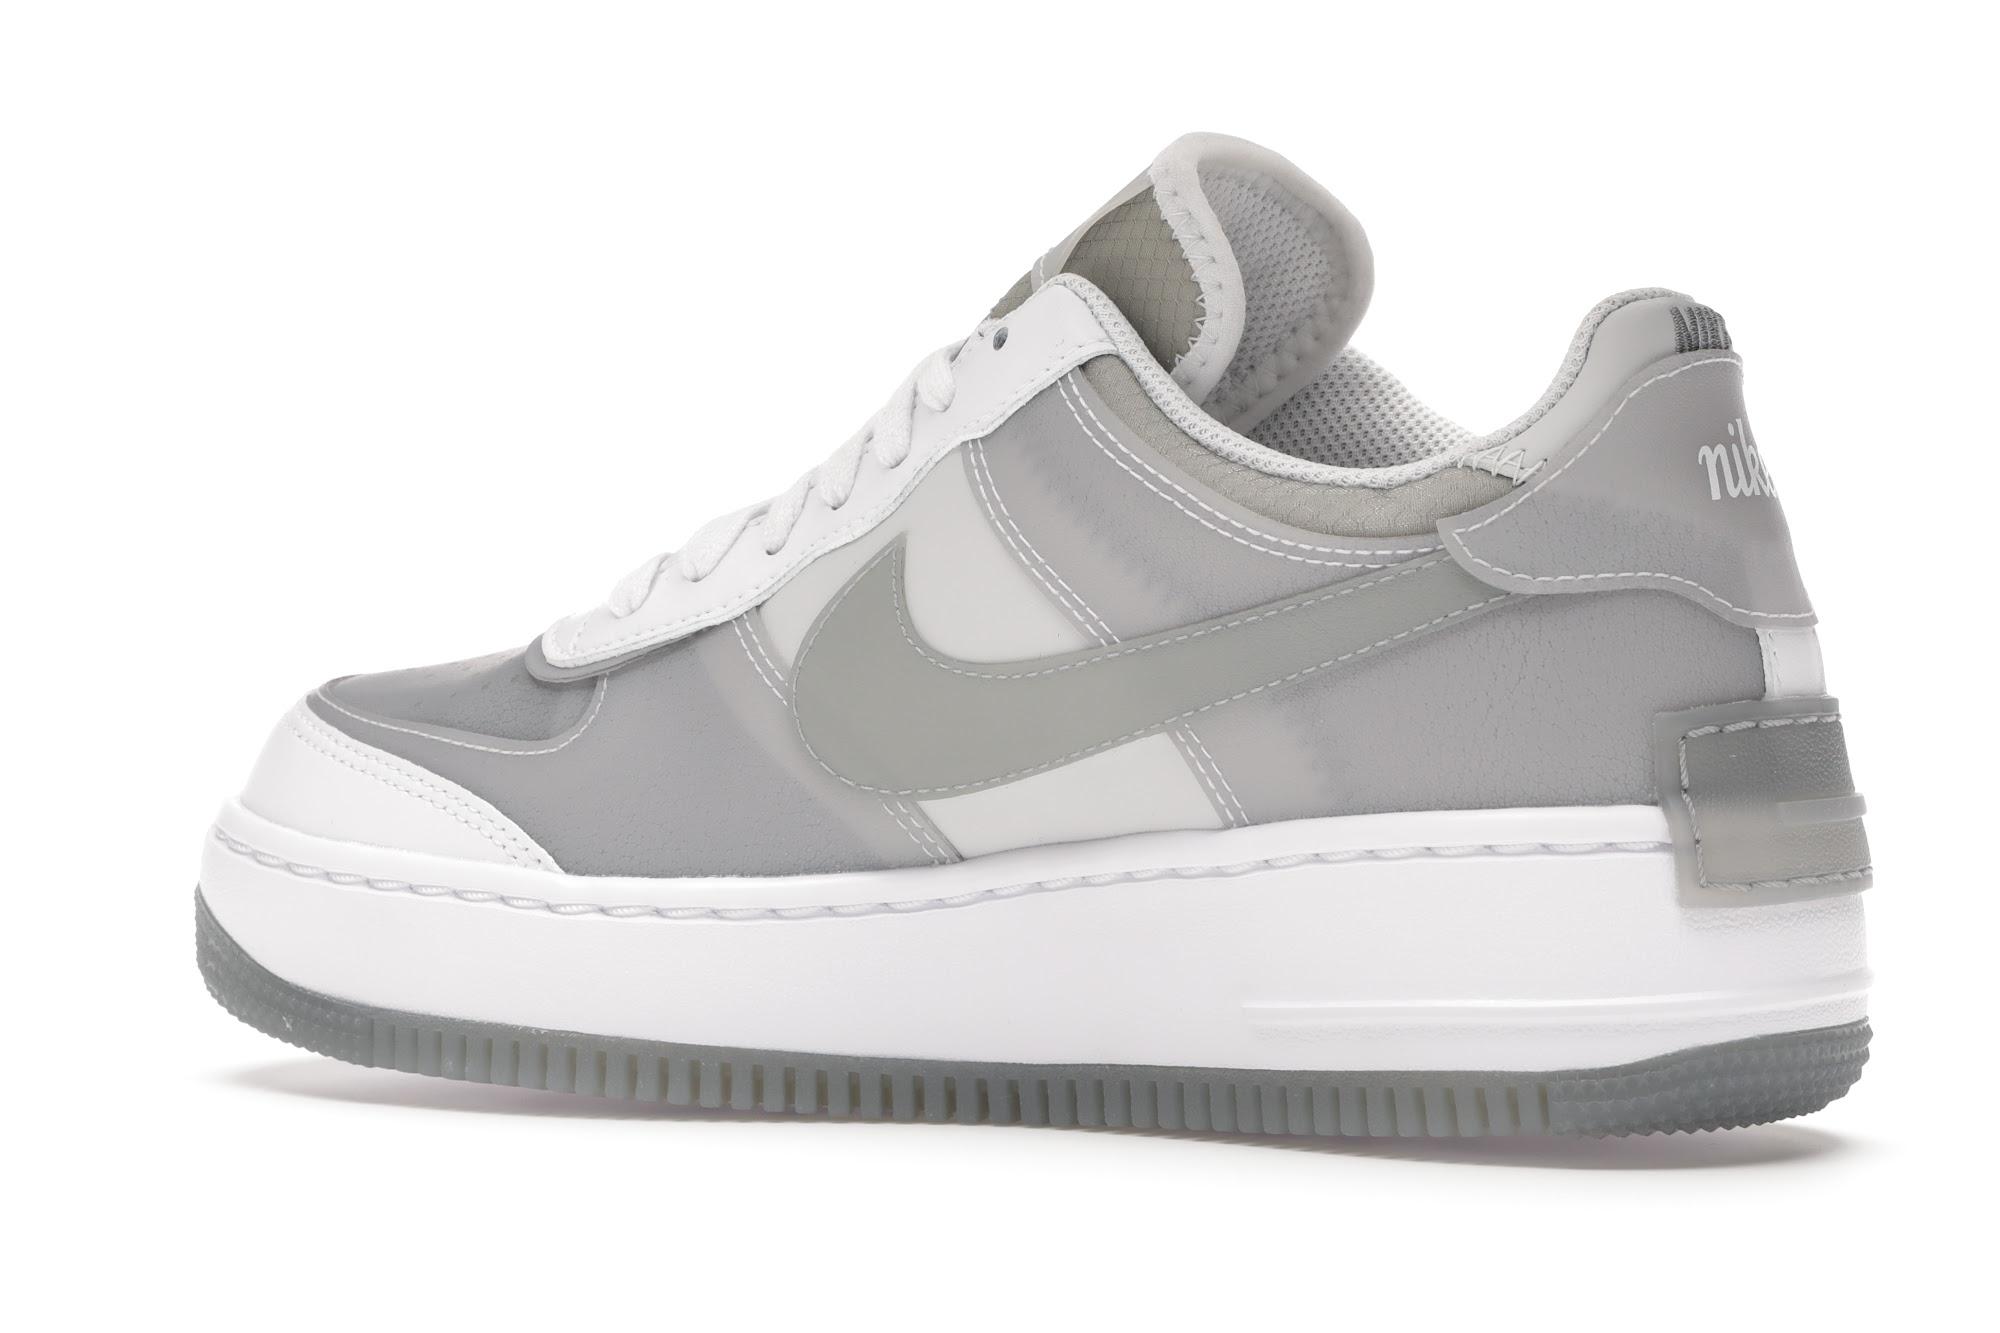 Nike Air Force 1 Shadow White Grey (W) - CK6561-100